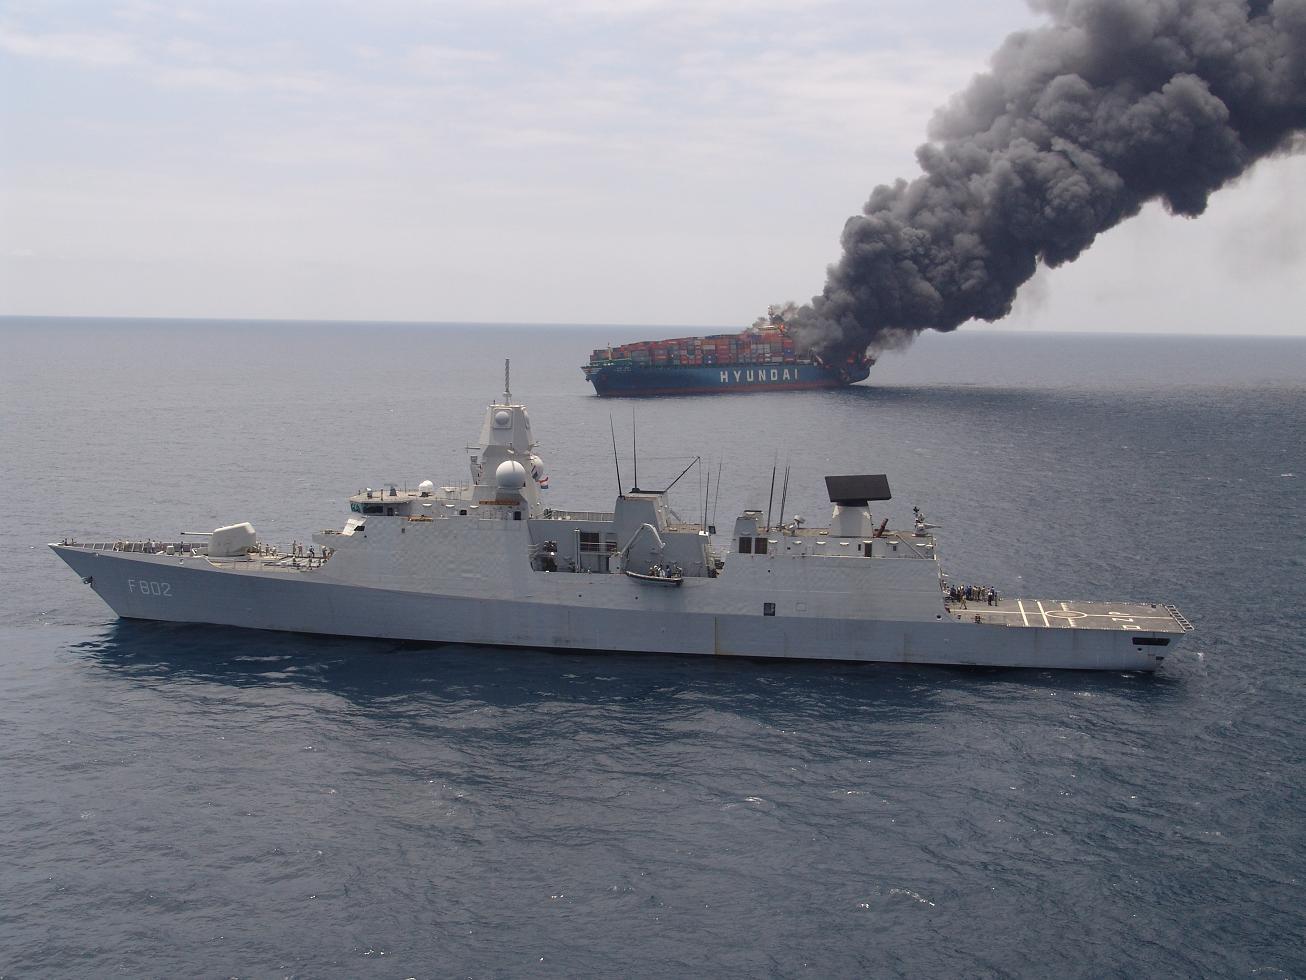 Hr Ms De Zeven Provinciën helpt brandend containerschip2 tcm46-95807.jpg